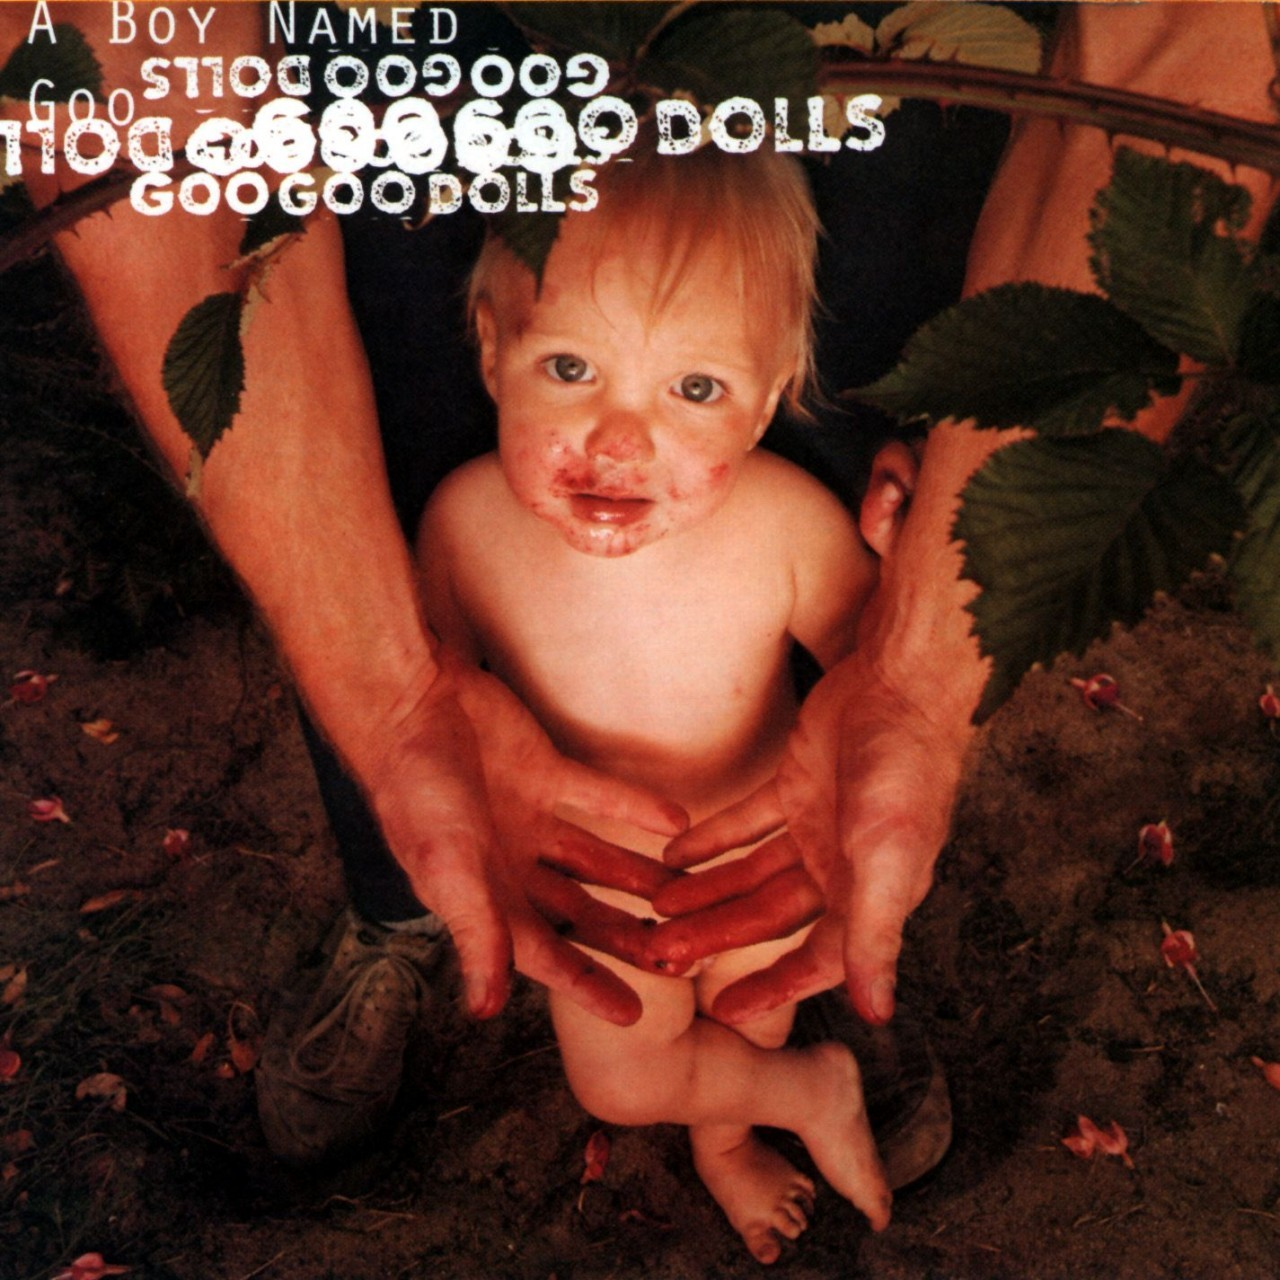 Goo Goo Dolls - A Boy Named Goo LP